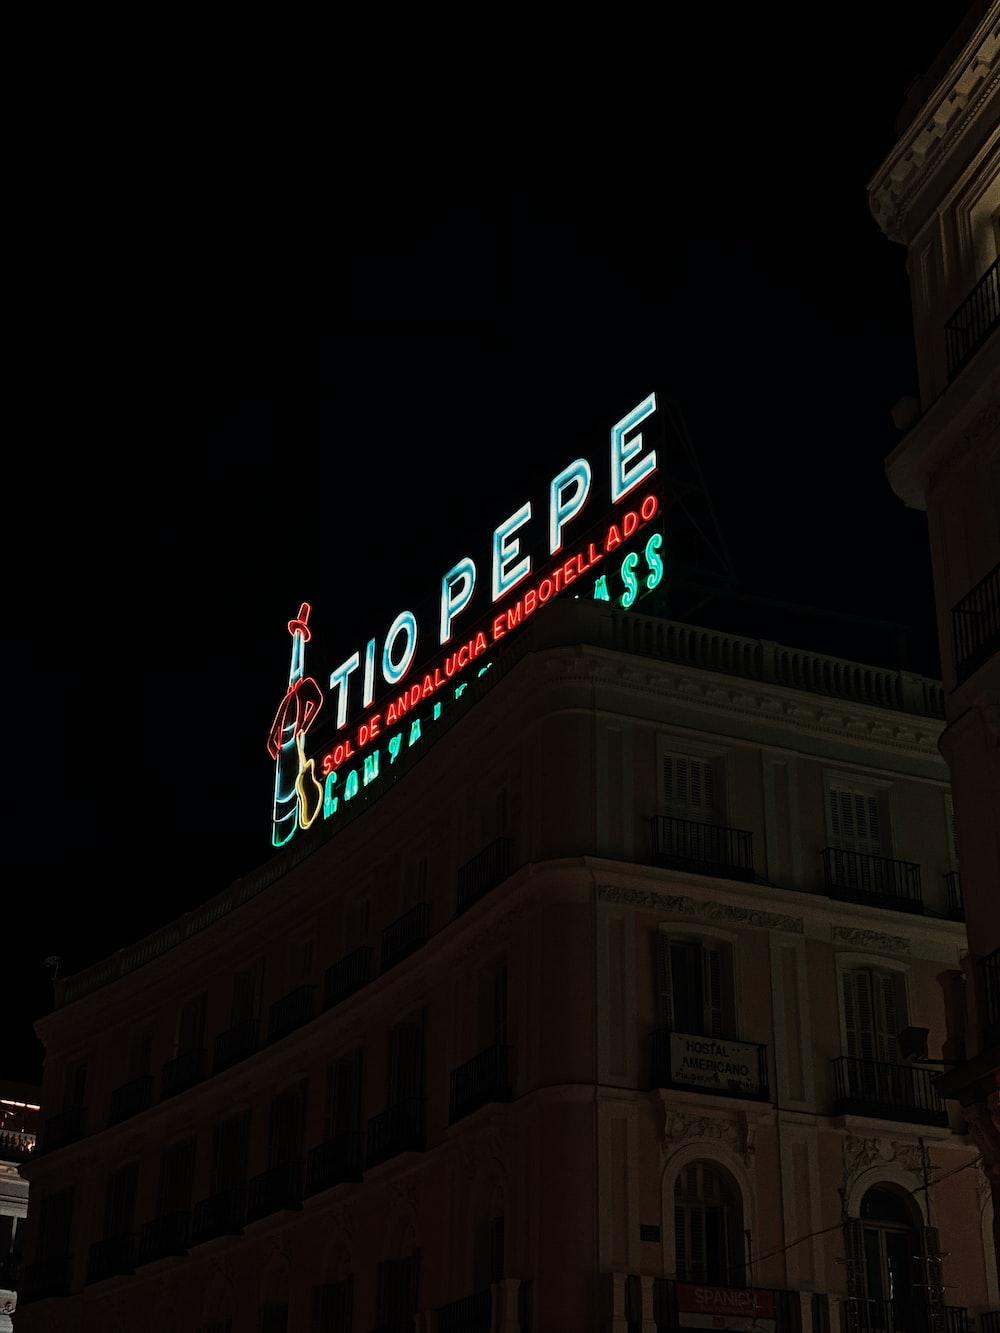 Tio Pepe signage at night